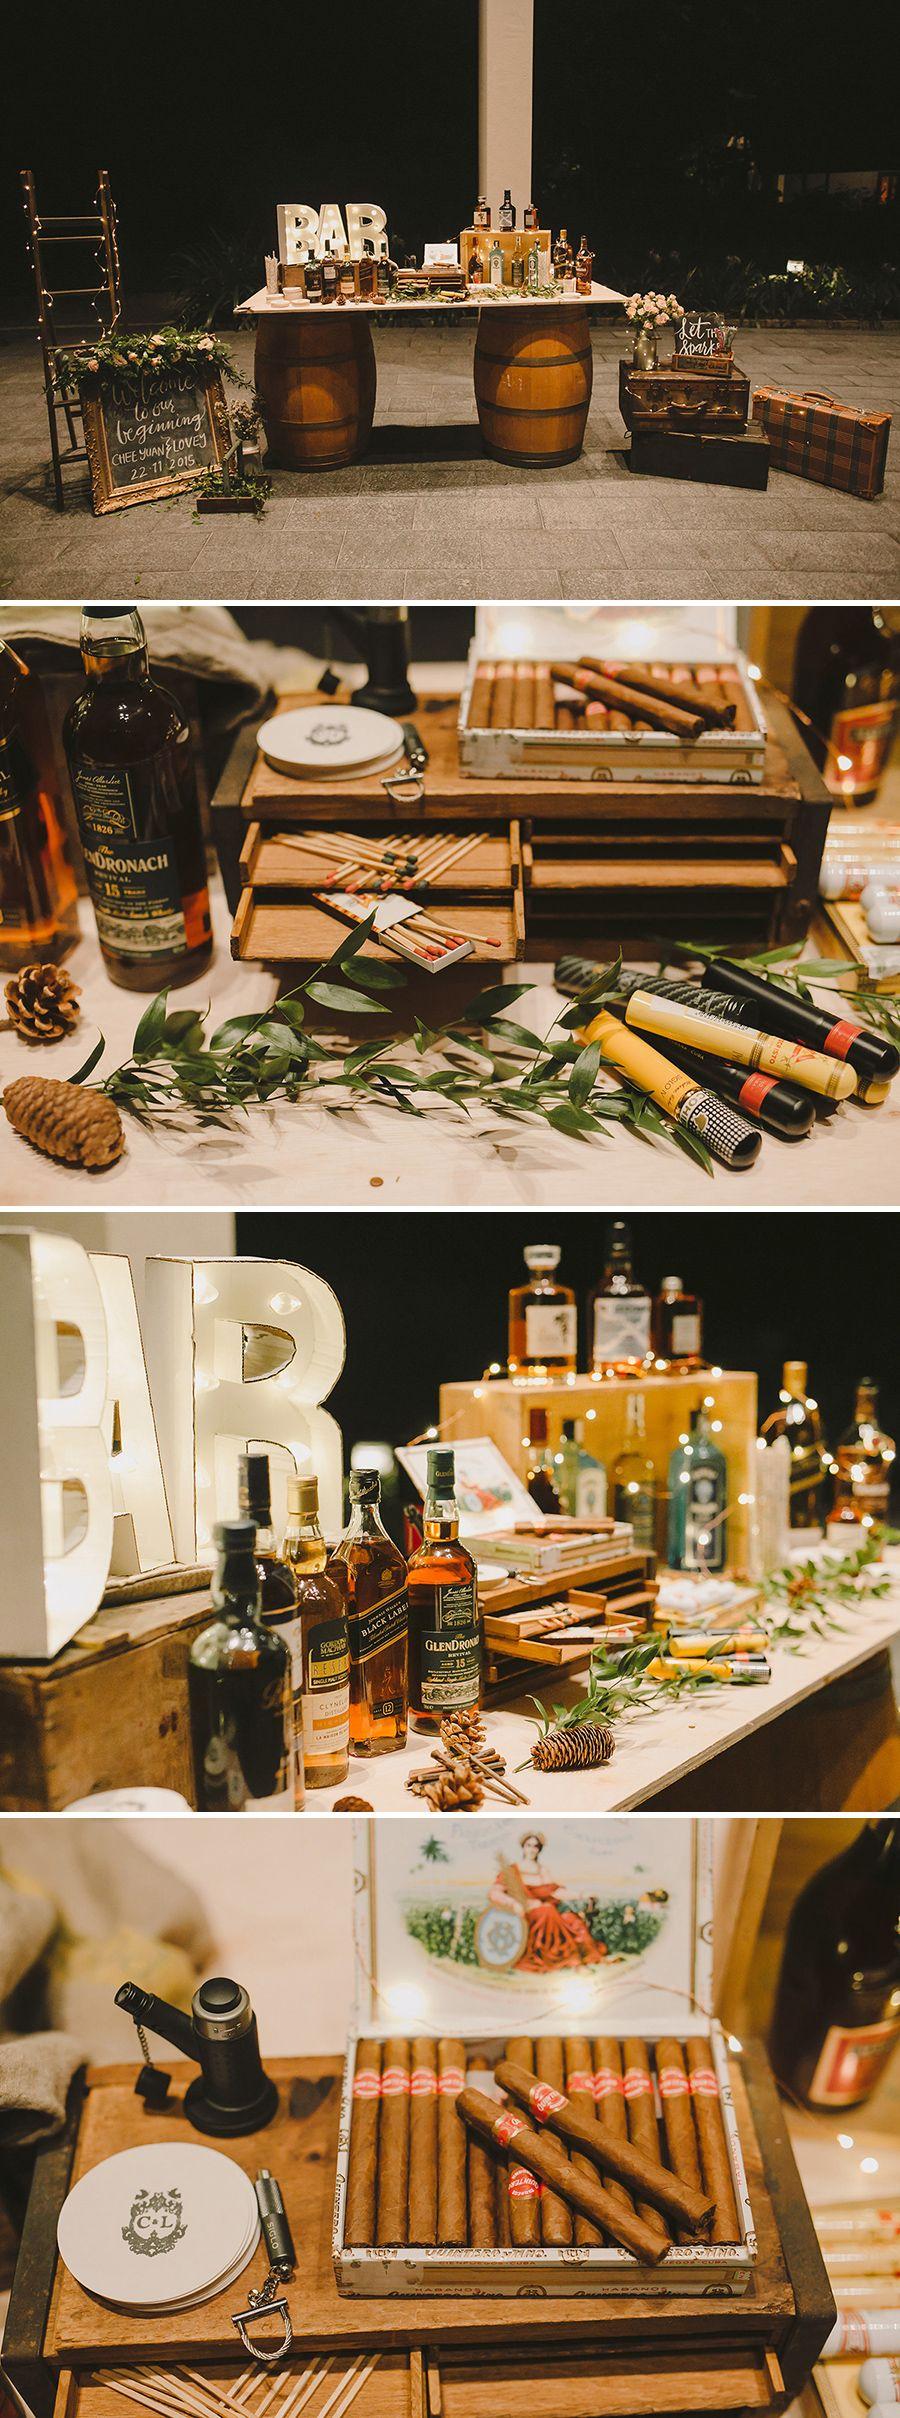 5 Admirable Wedding Food and Drink Bar Ideas 5 Admirable Wedding Food and Drink Bar Ideas new pictures